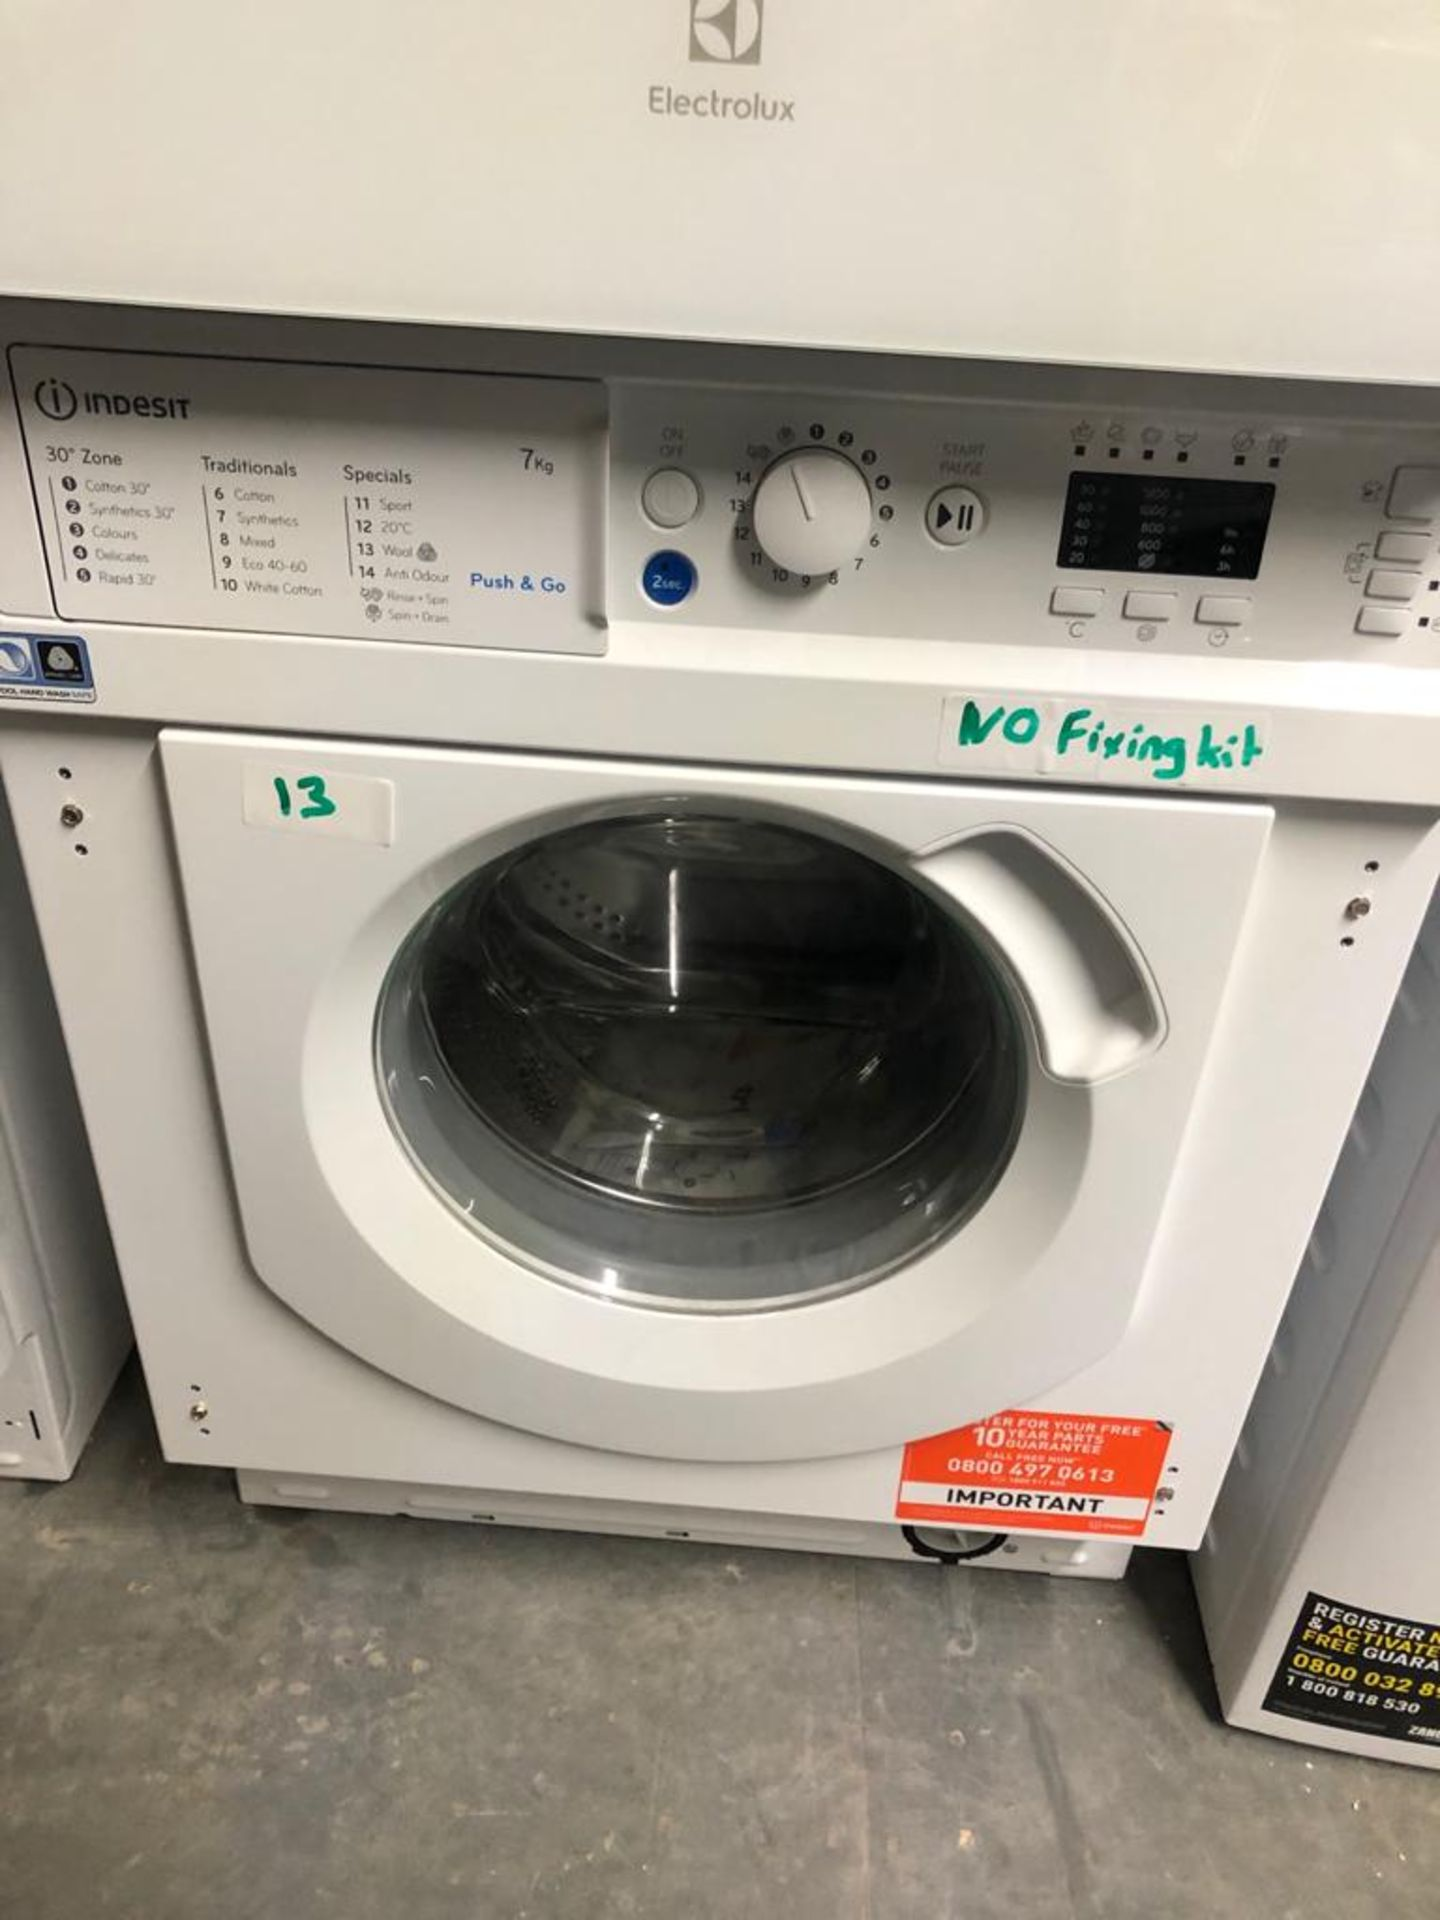 NEW/GRADED AND UNPACKAGED Indesit BIWMIL71252UK Built-In Slim Depth Washing Machine (Missing